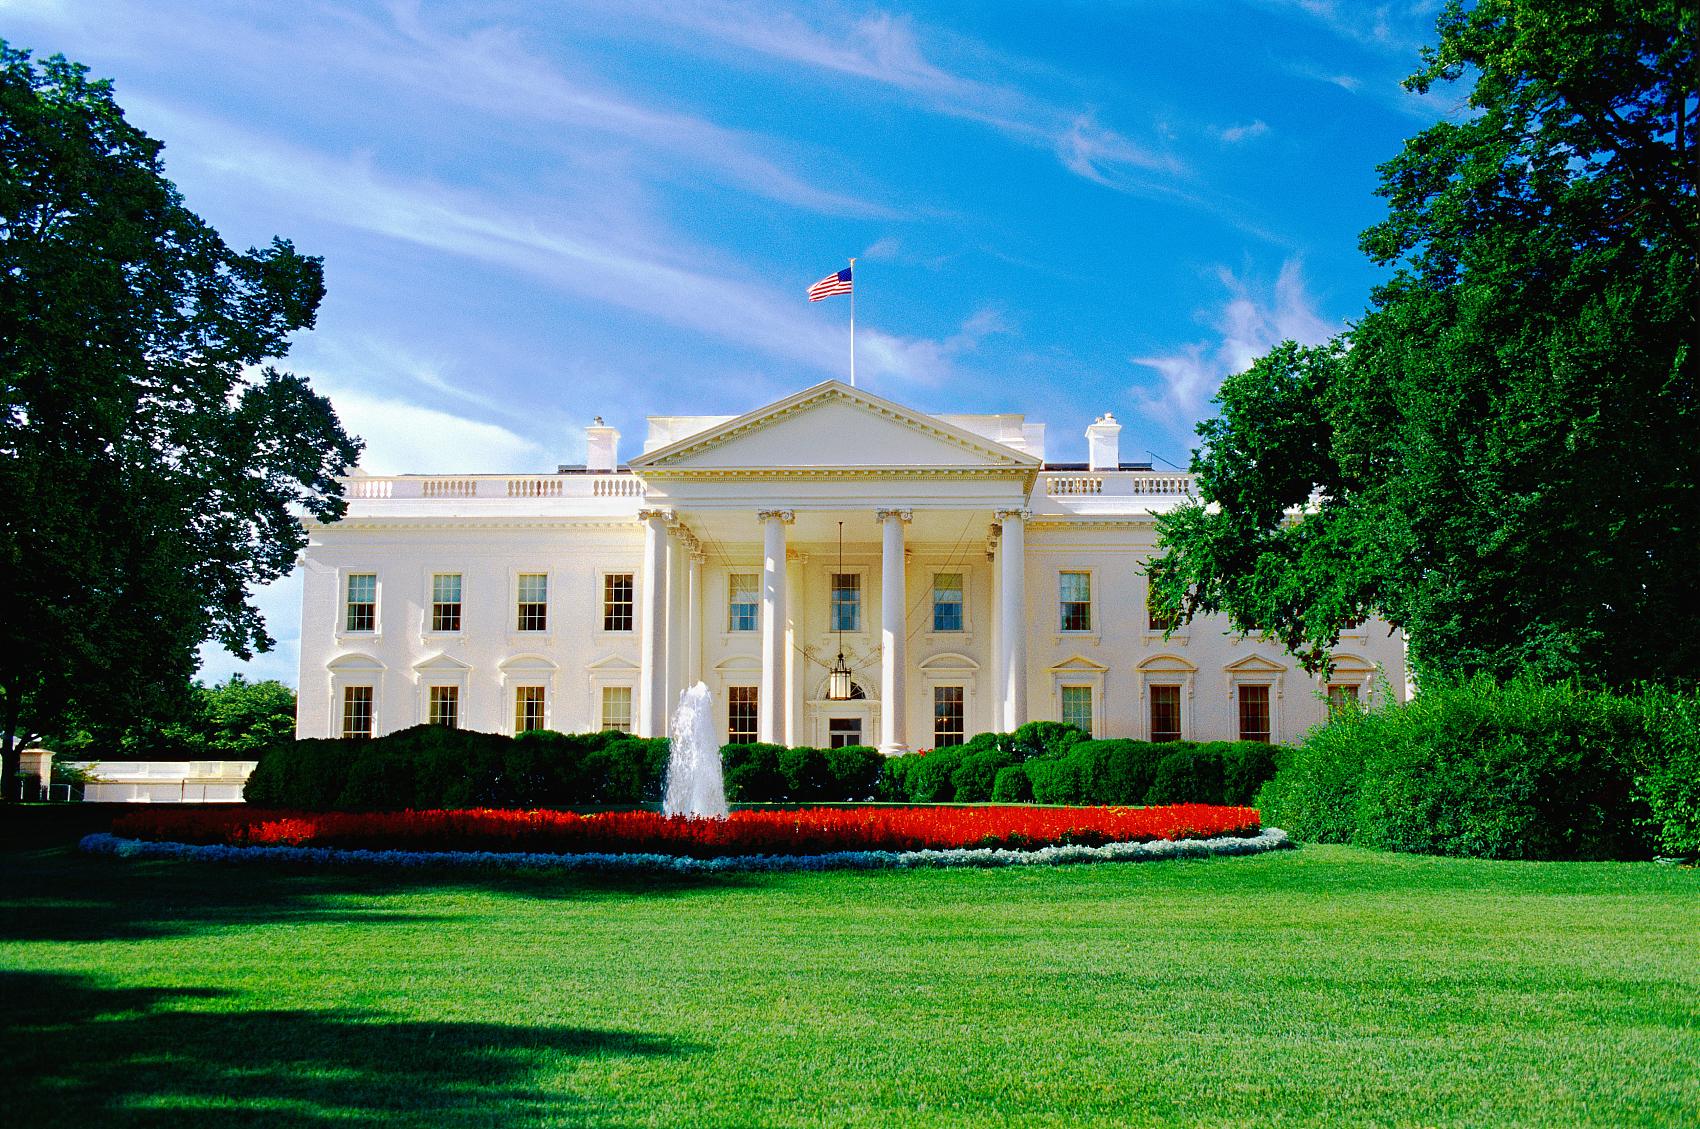 White House locked down